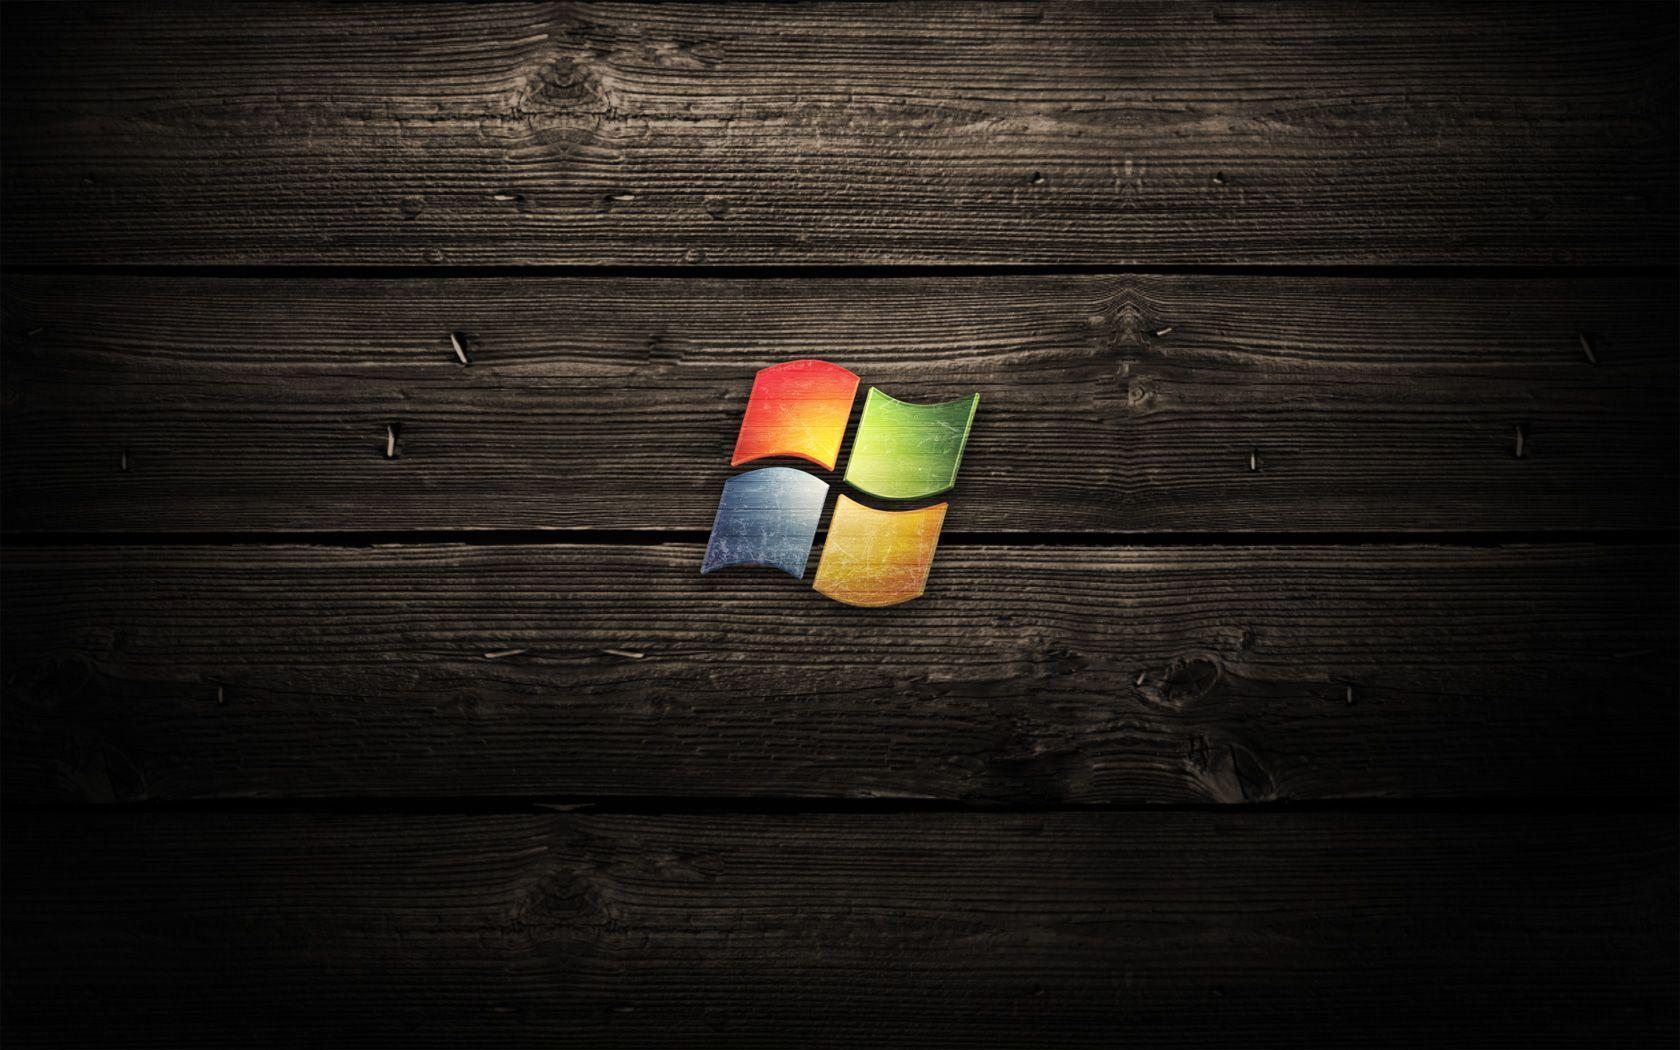 windows xp wallpapers hd - wallpaper cave